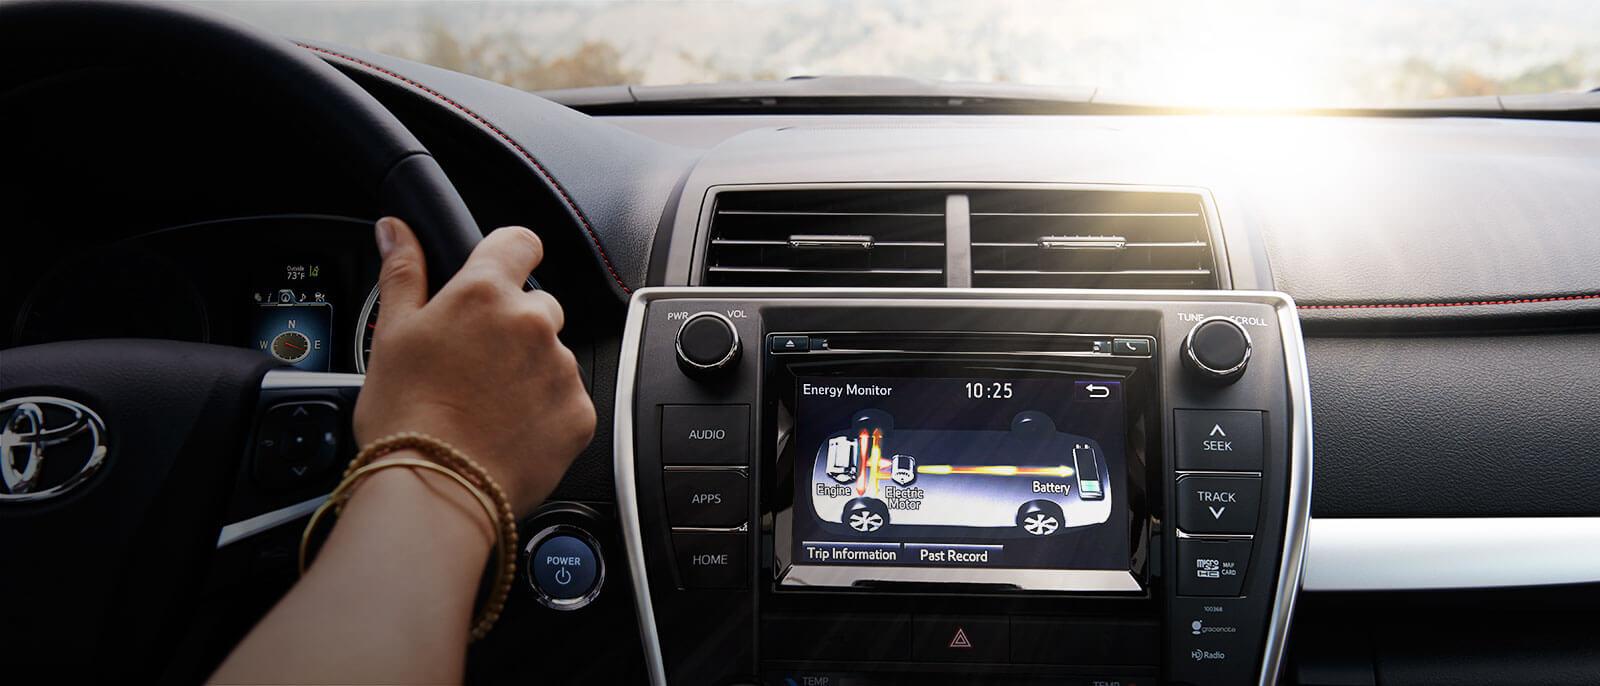 2016 Toyota Camry Hybrid interior